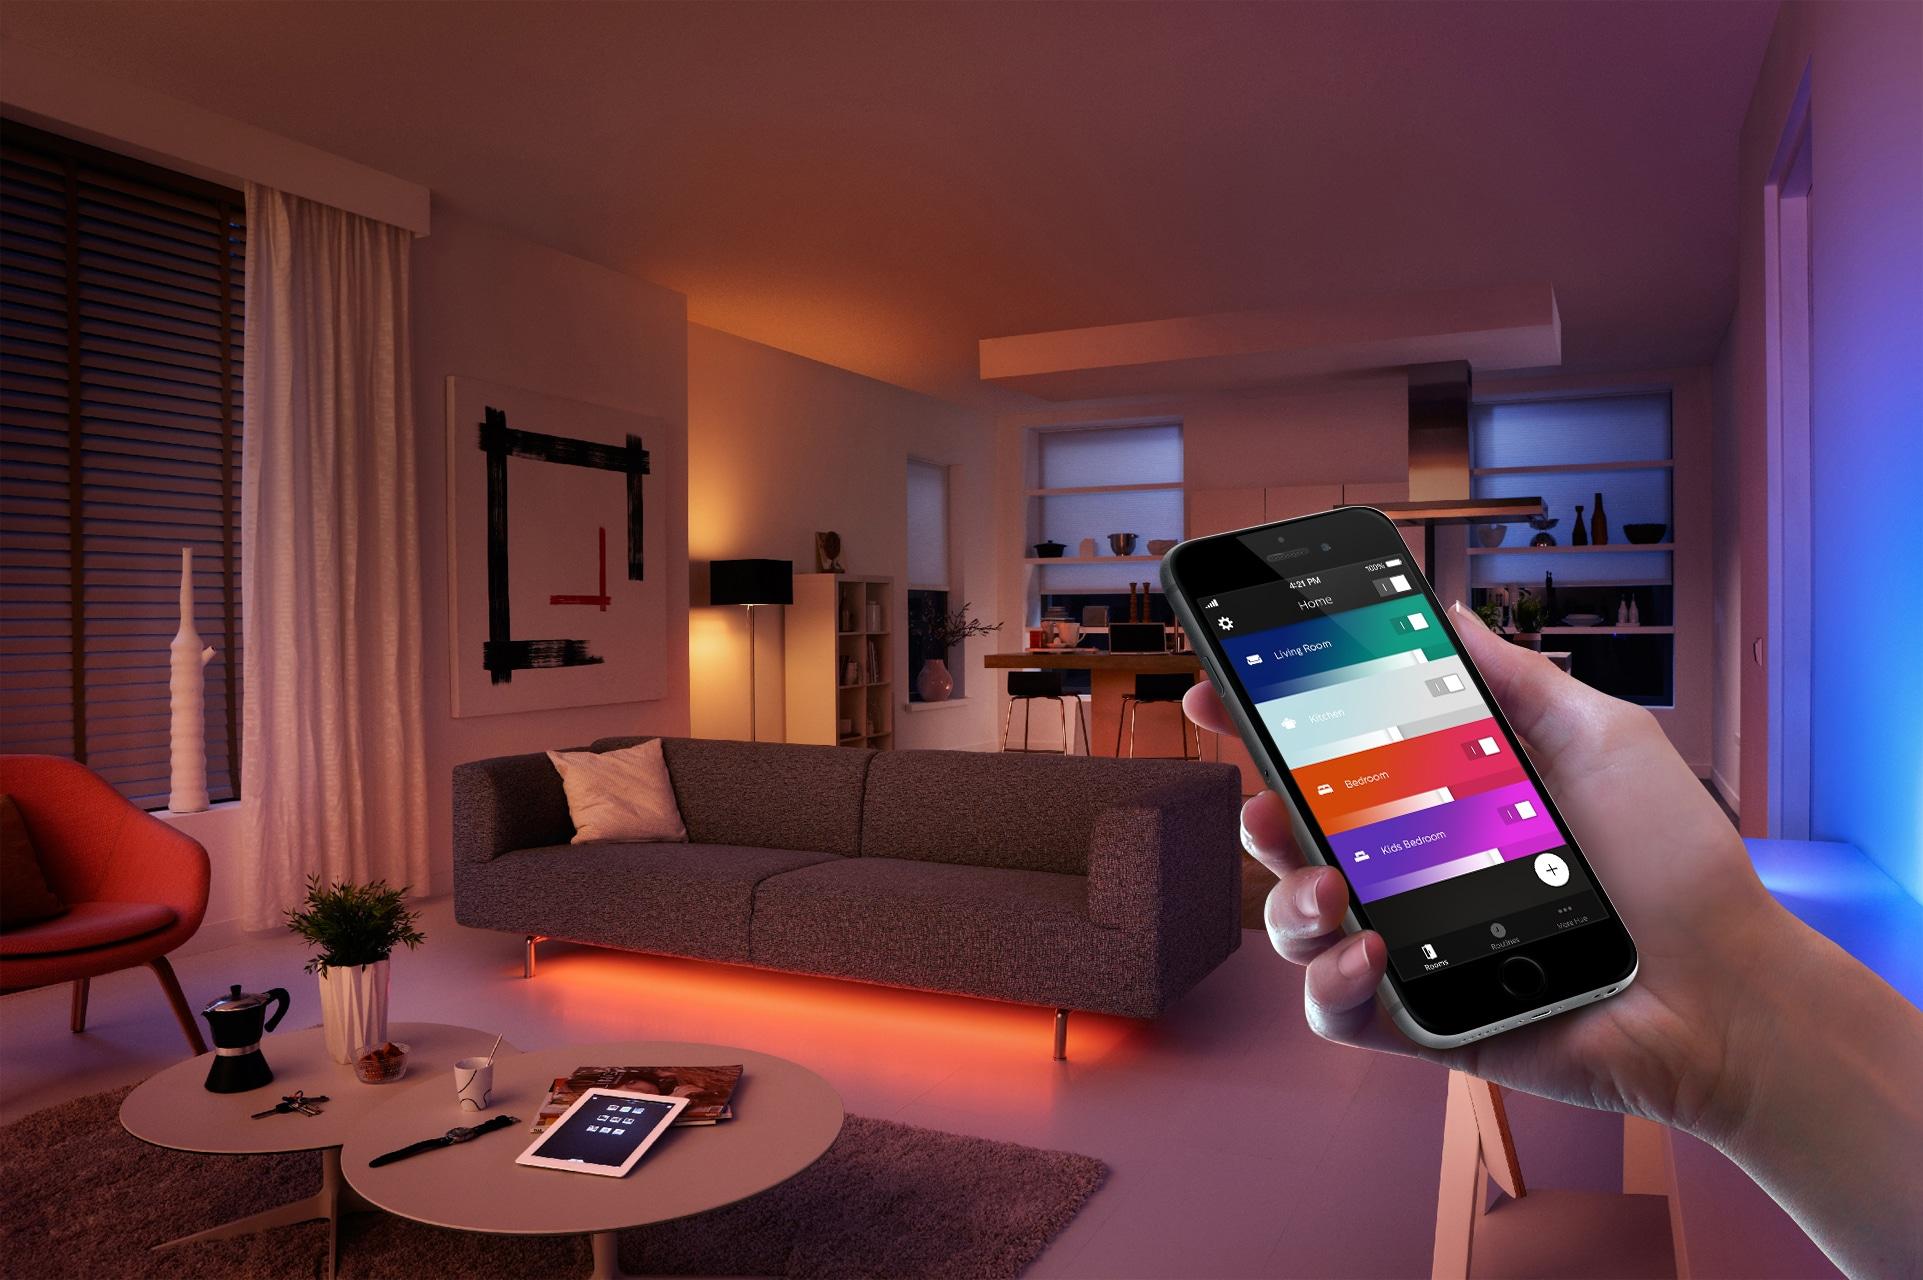 Neue Philips Hue App Macht Beleuchtung Intelligenter